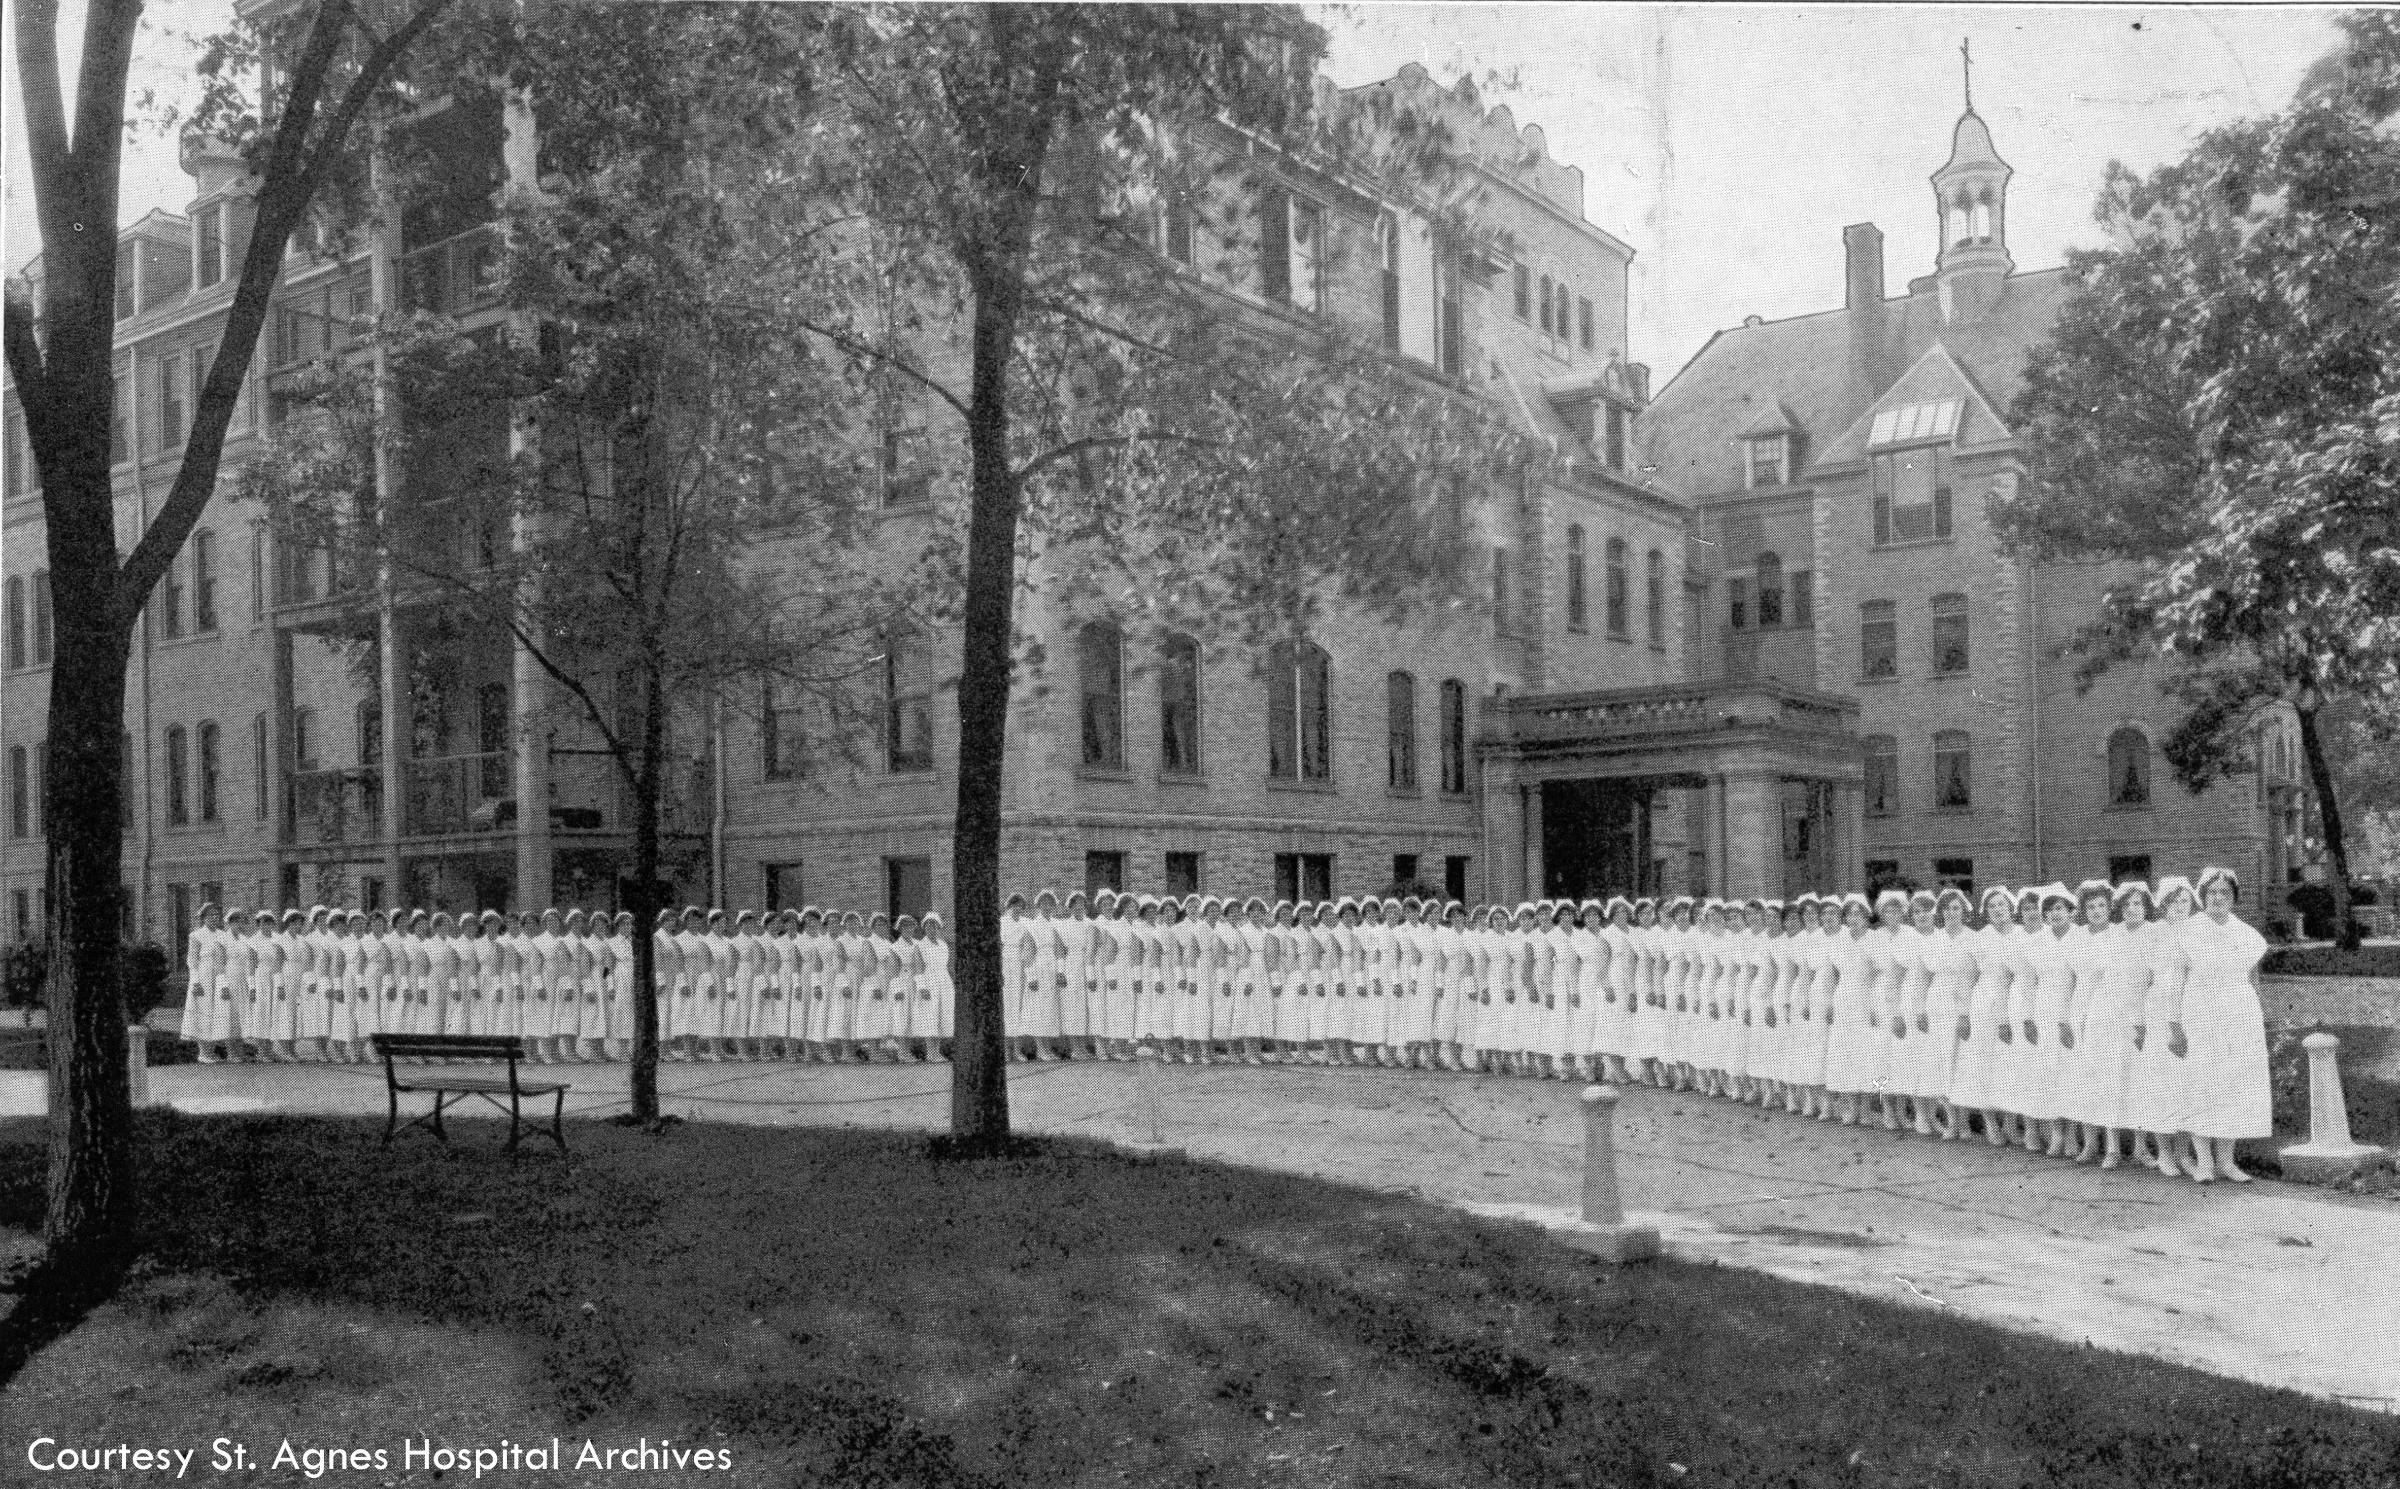 Nursing students stand outside St. Agnes Hospital, c. 1925.